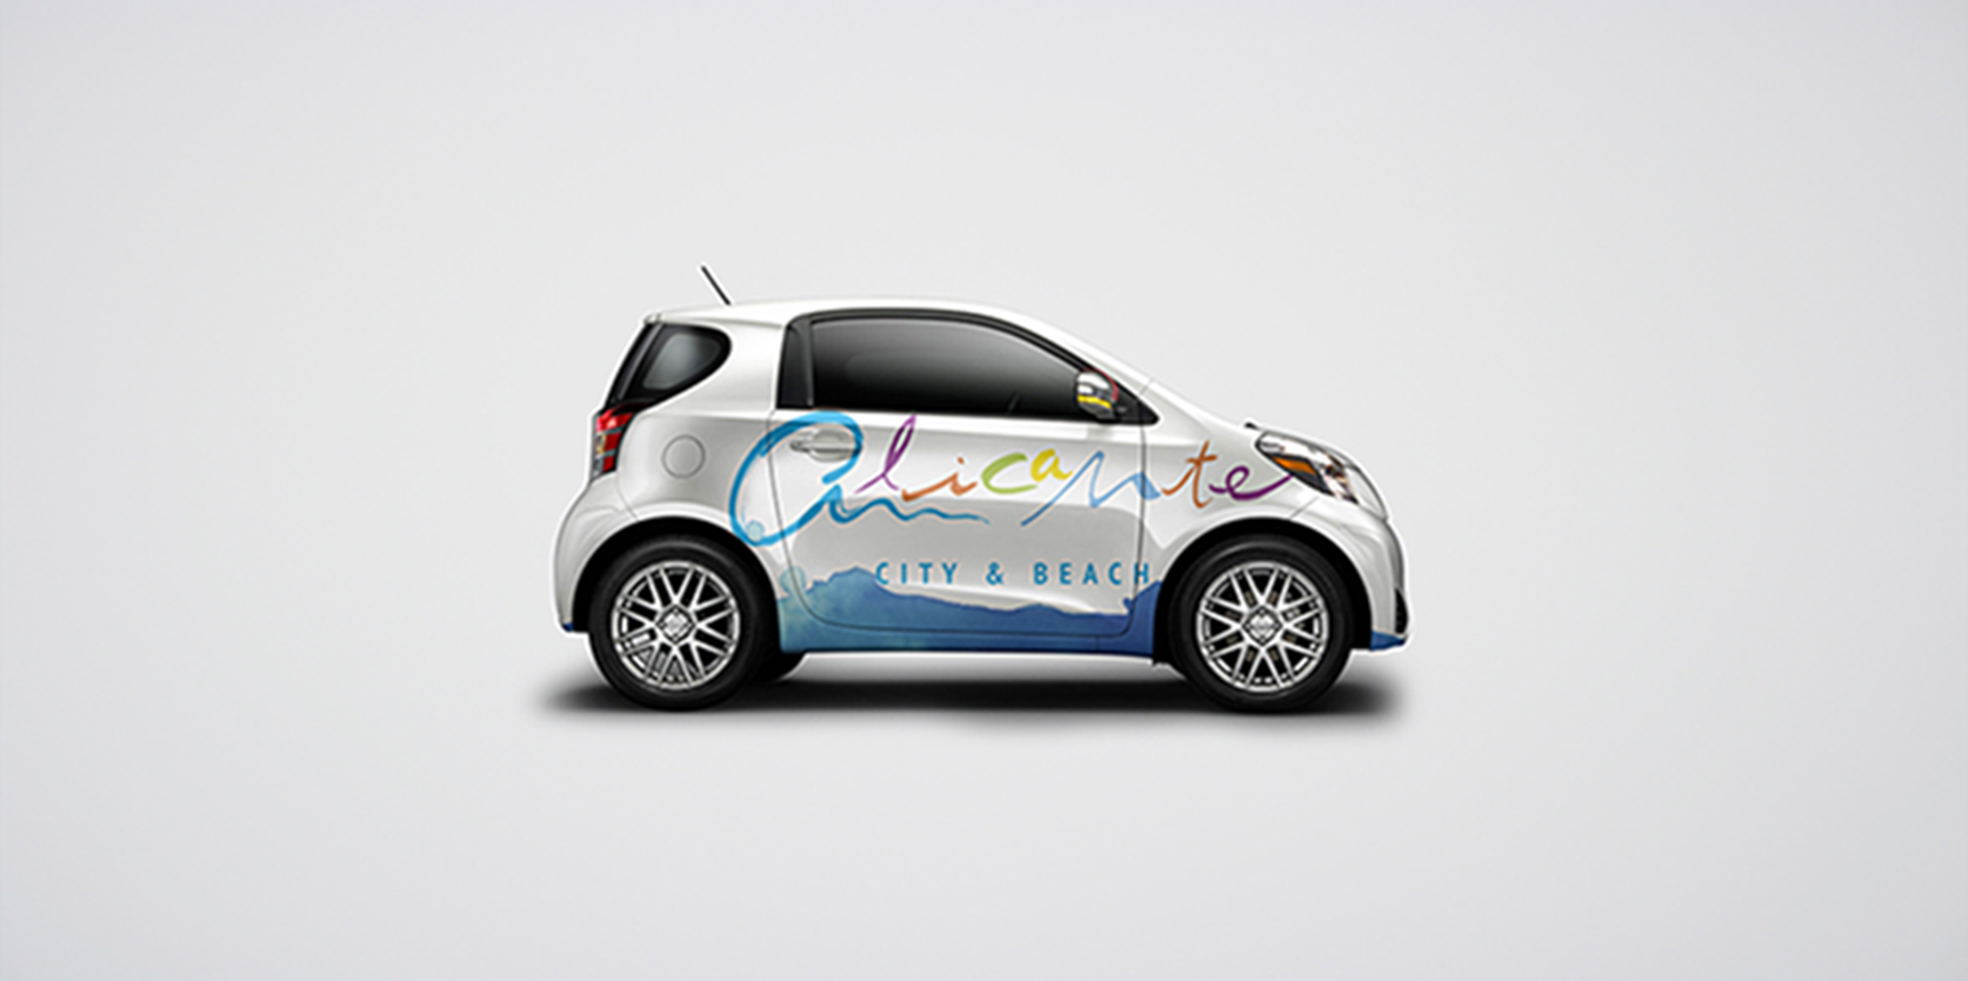 Rotulación coche Alicante City & Experience